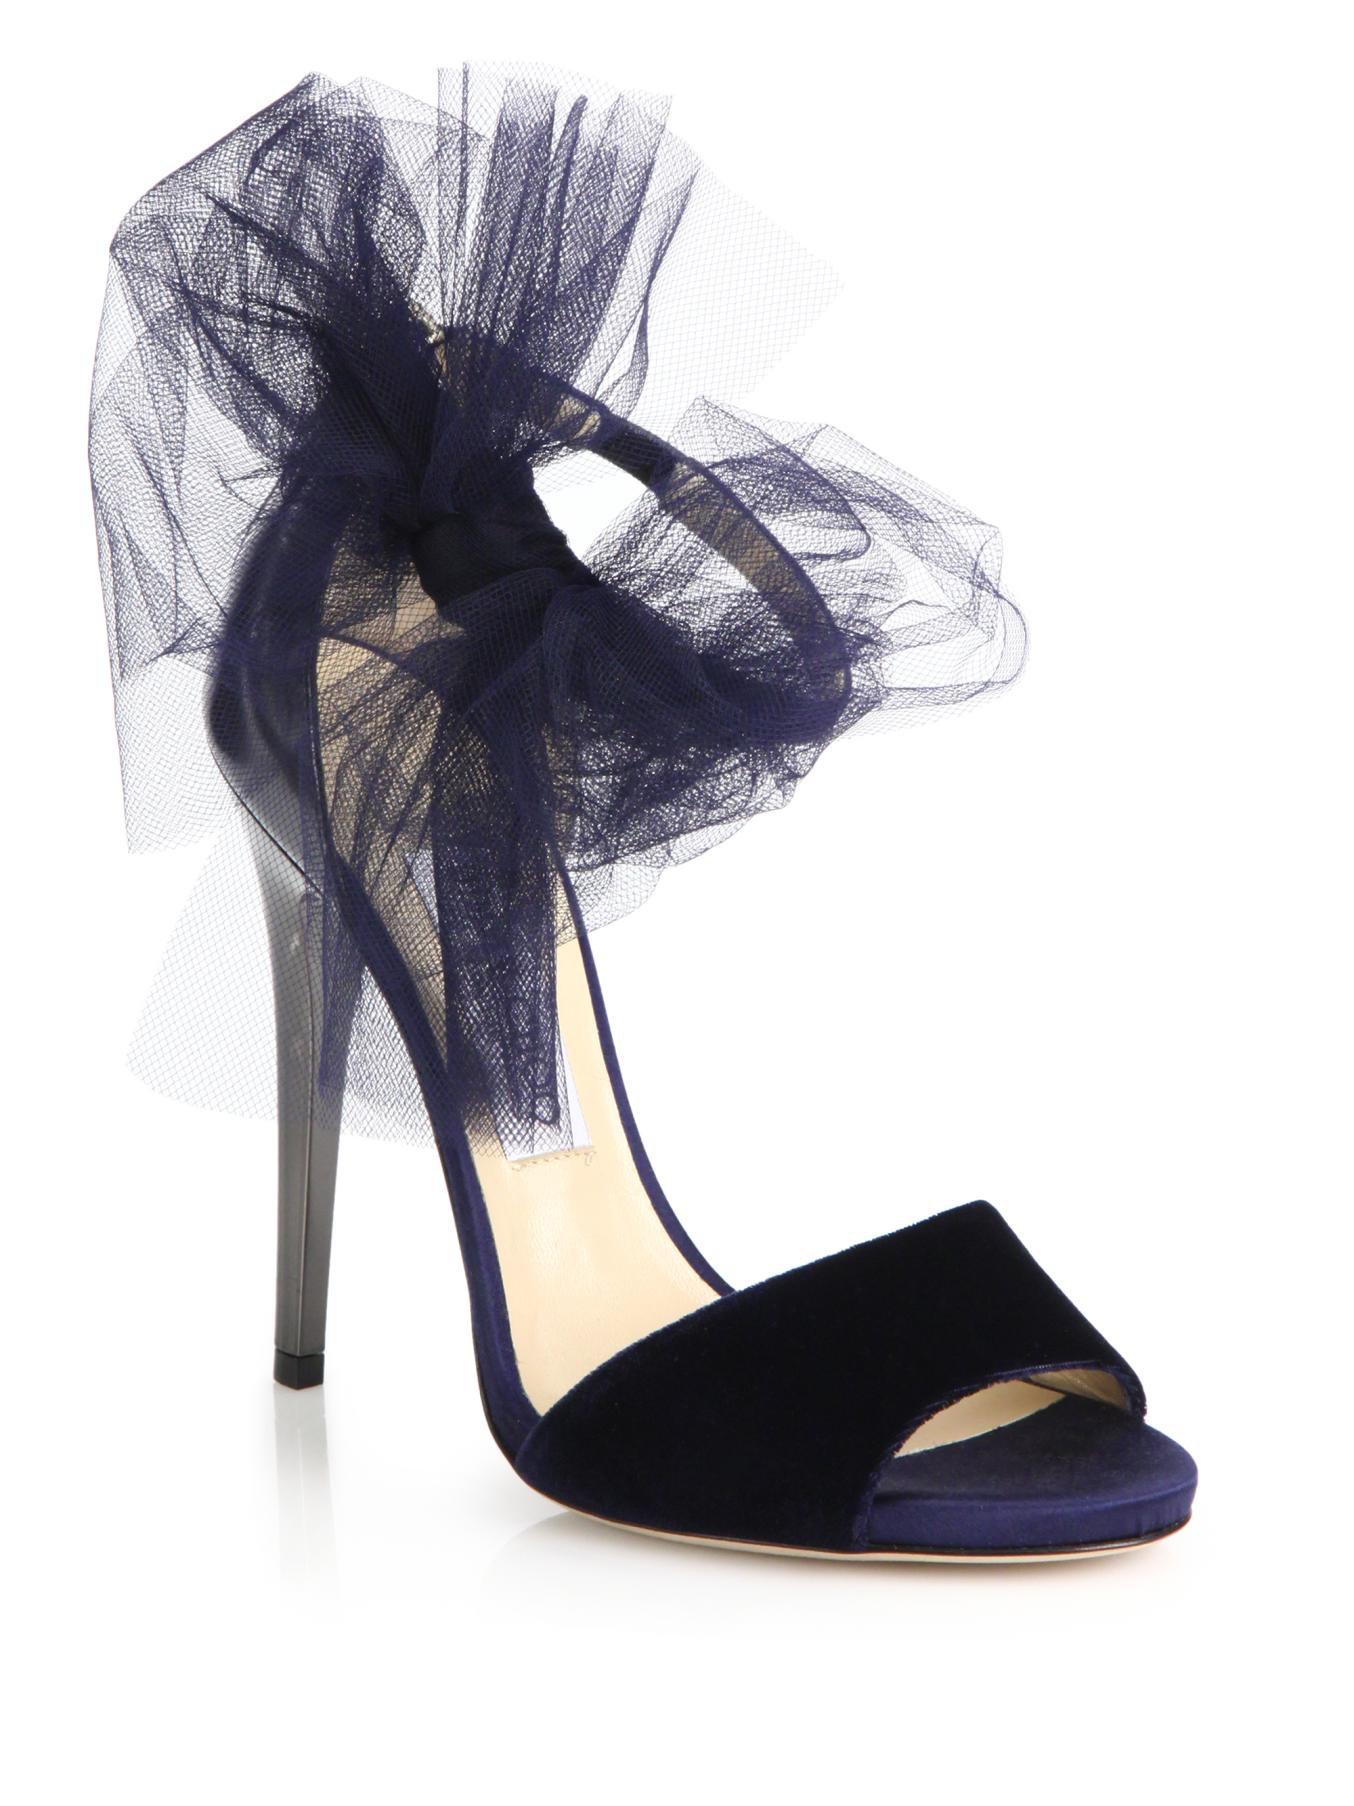 Jimmy choo 'Lilyth 100' Tulle Bow Velvet Sandals in Blue | Lyst